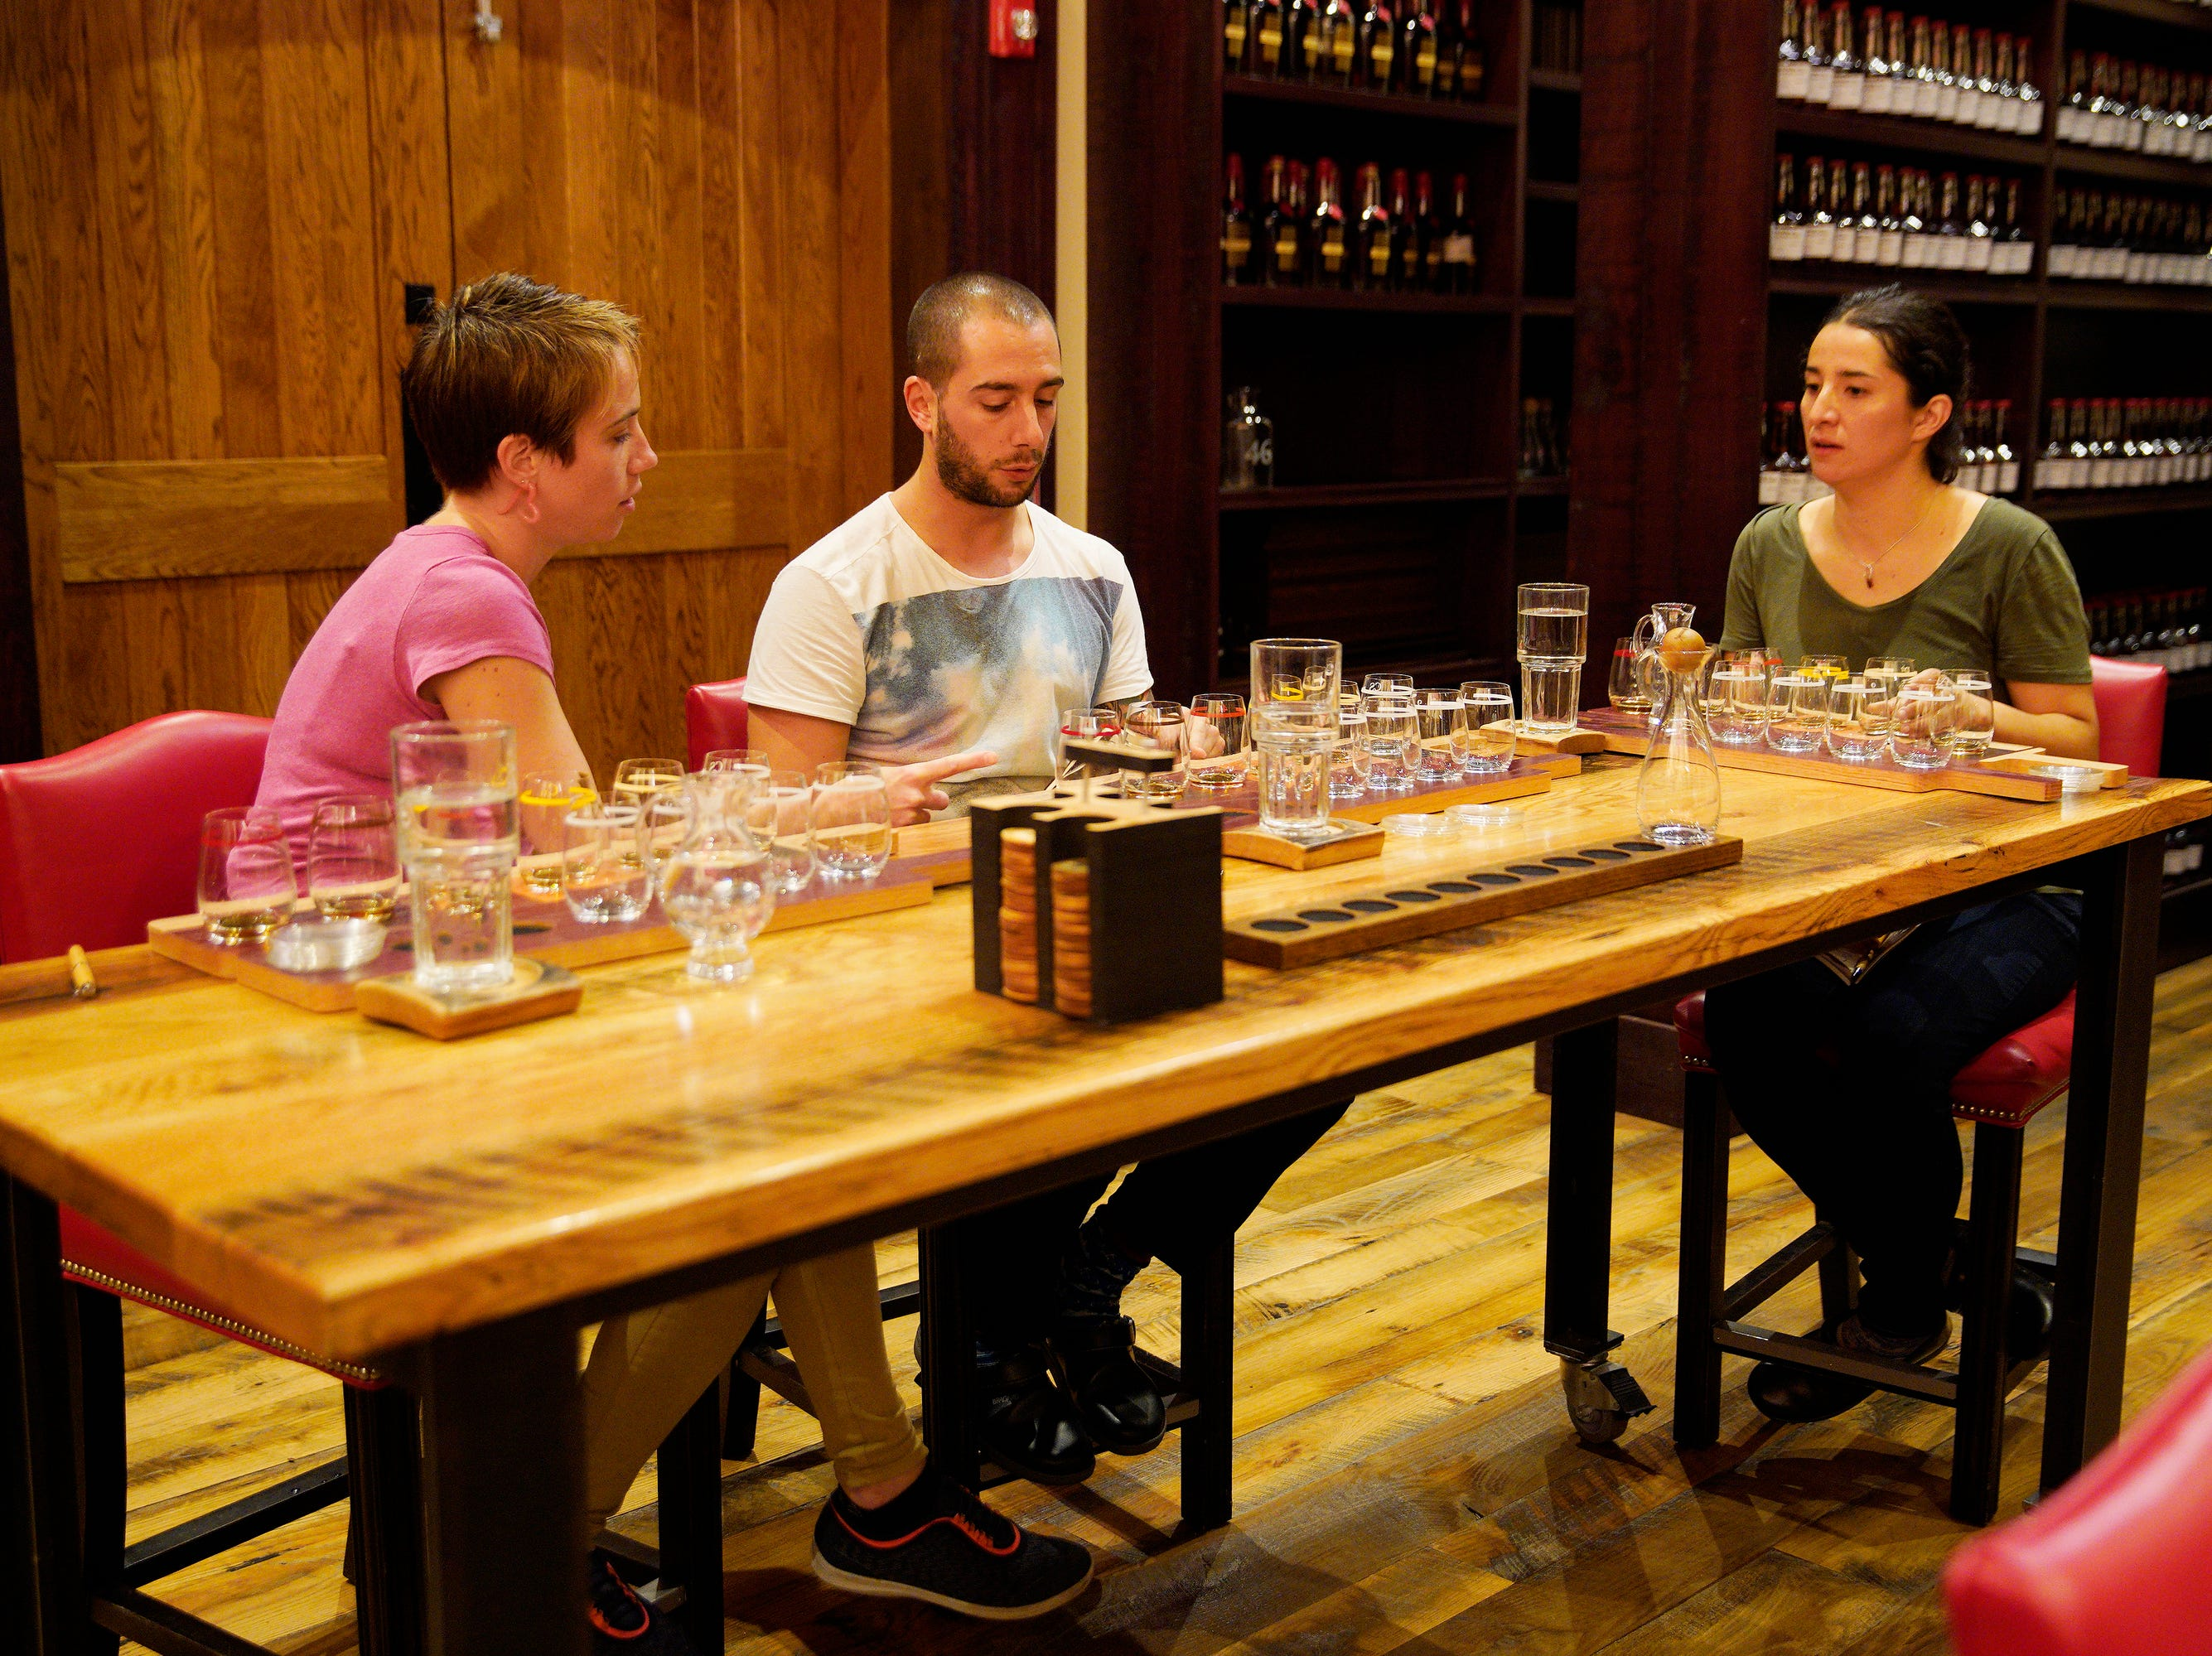 "(Left to right) Chefs Adrienne Wright, Pablo Lamon and Michelle Minori taste bourbon at the Maker's Mark distillery on episode 2 of ""Top Chef"" season 16."